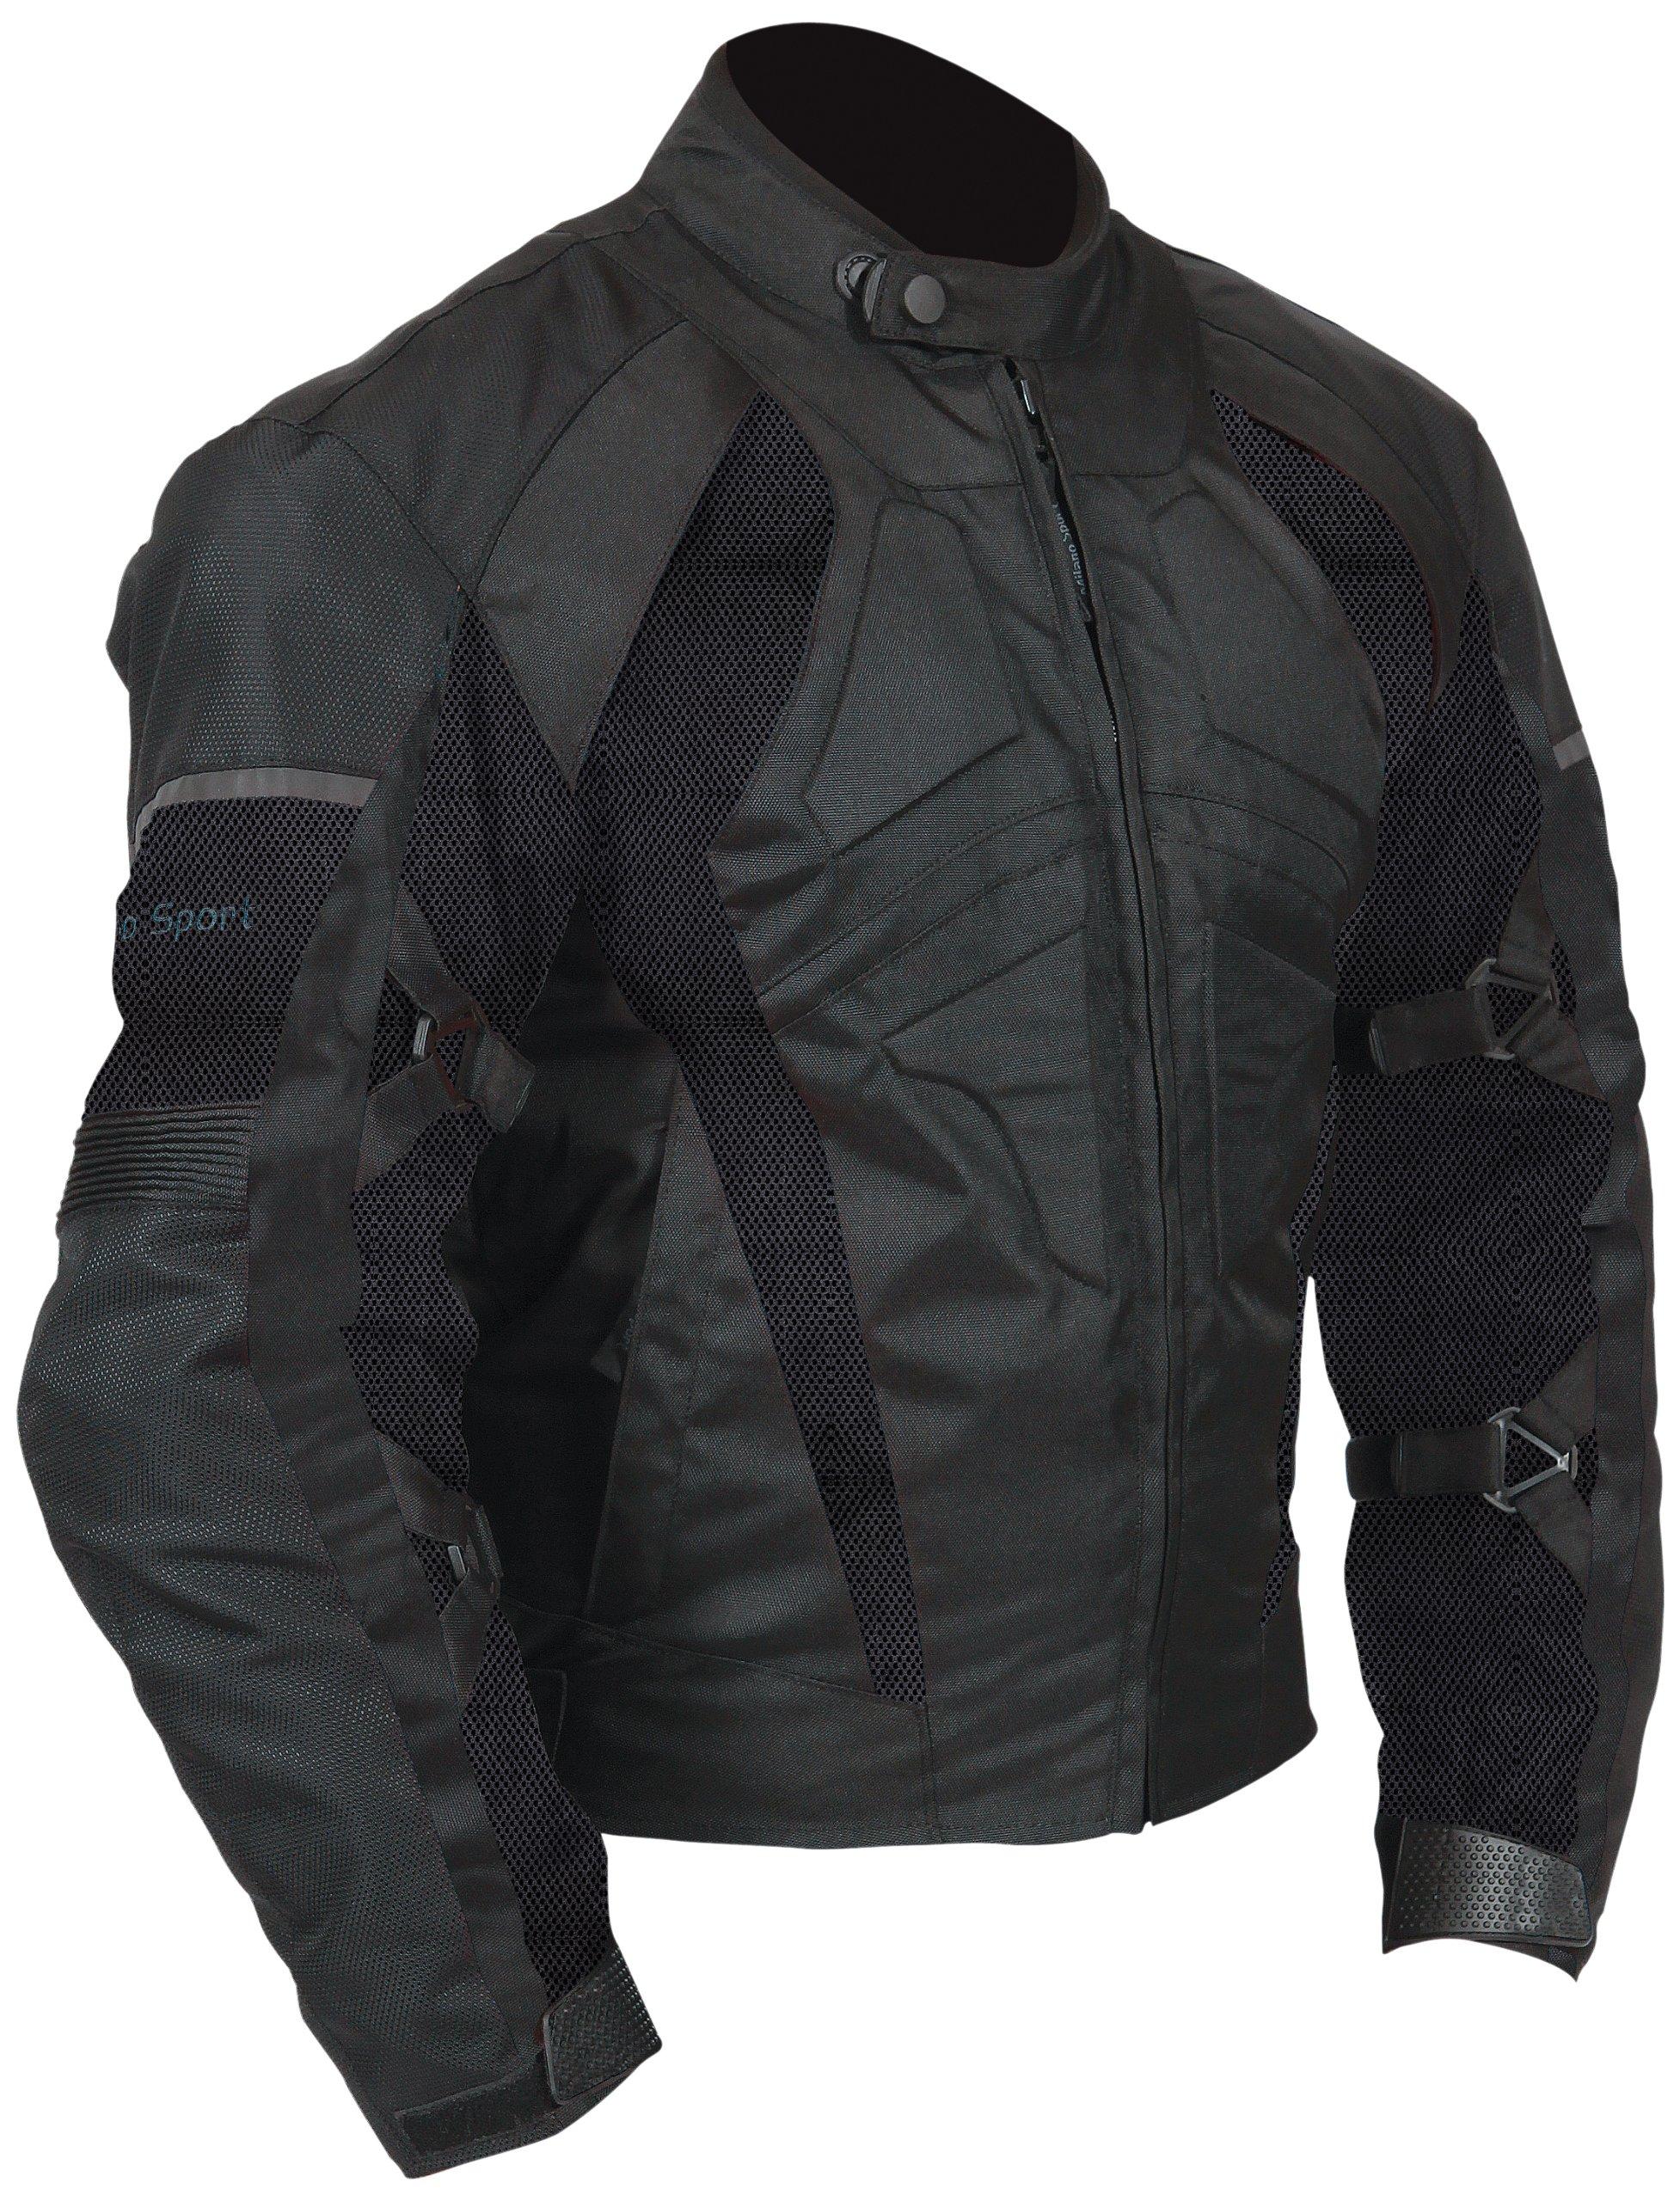 Milano Sport Gamma Motorcycle Air Jacket with Black Mesh Panel (Black, Large)